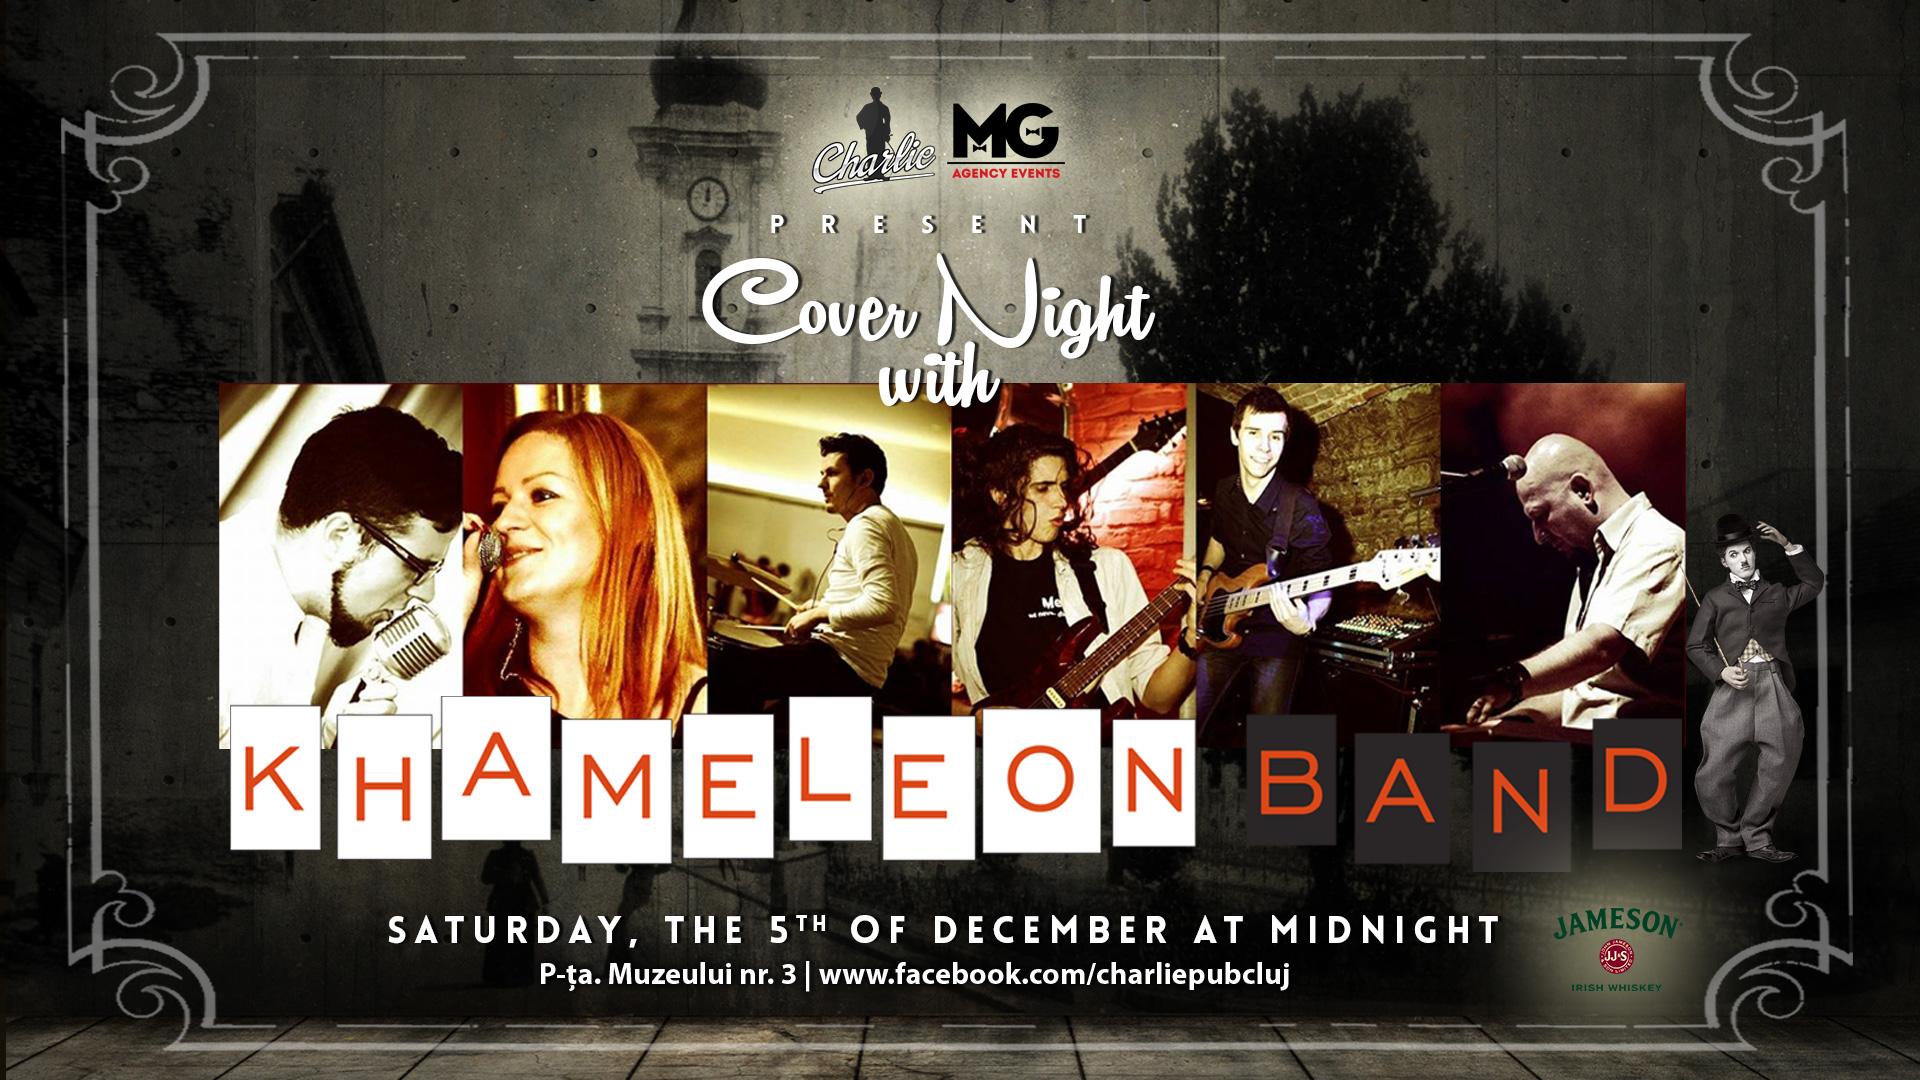 Cover Night with Khameleon Band @ Charlie